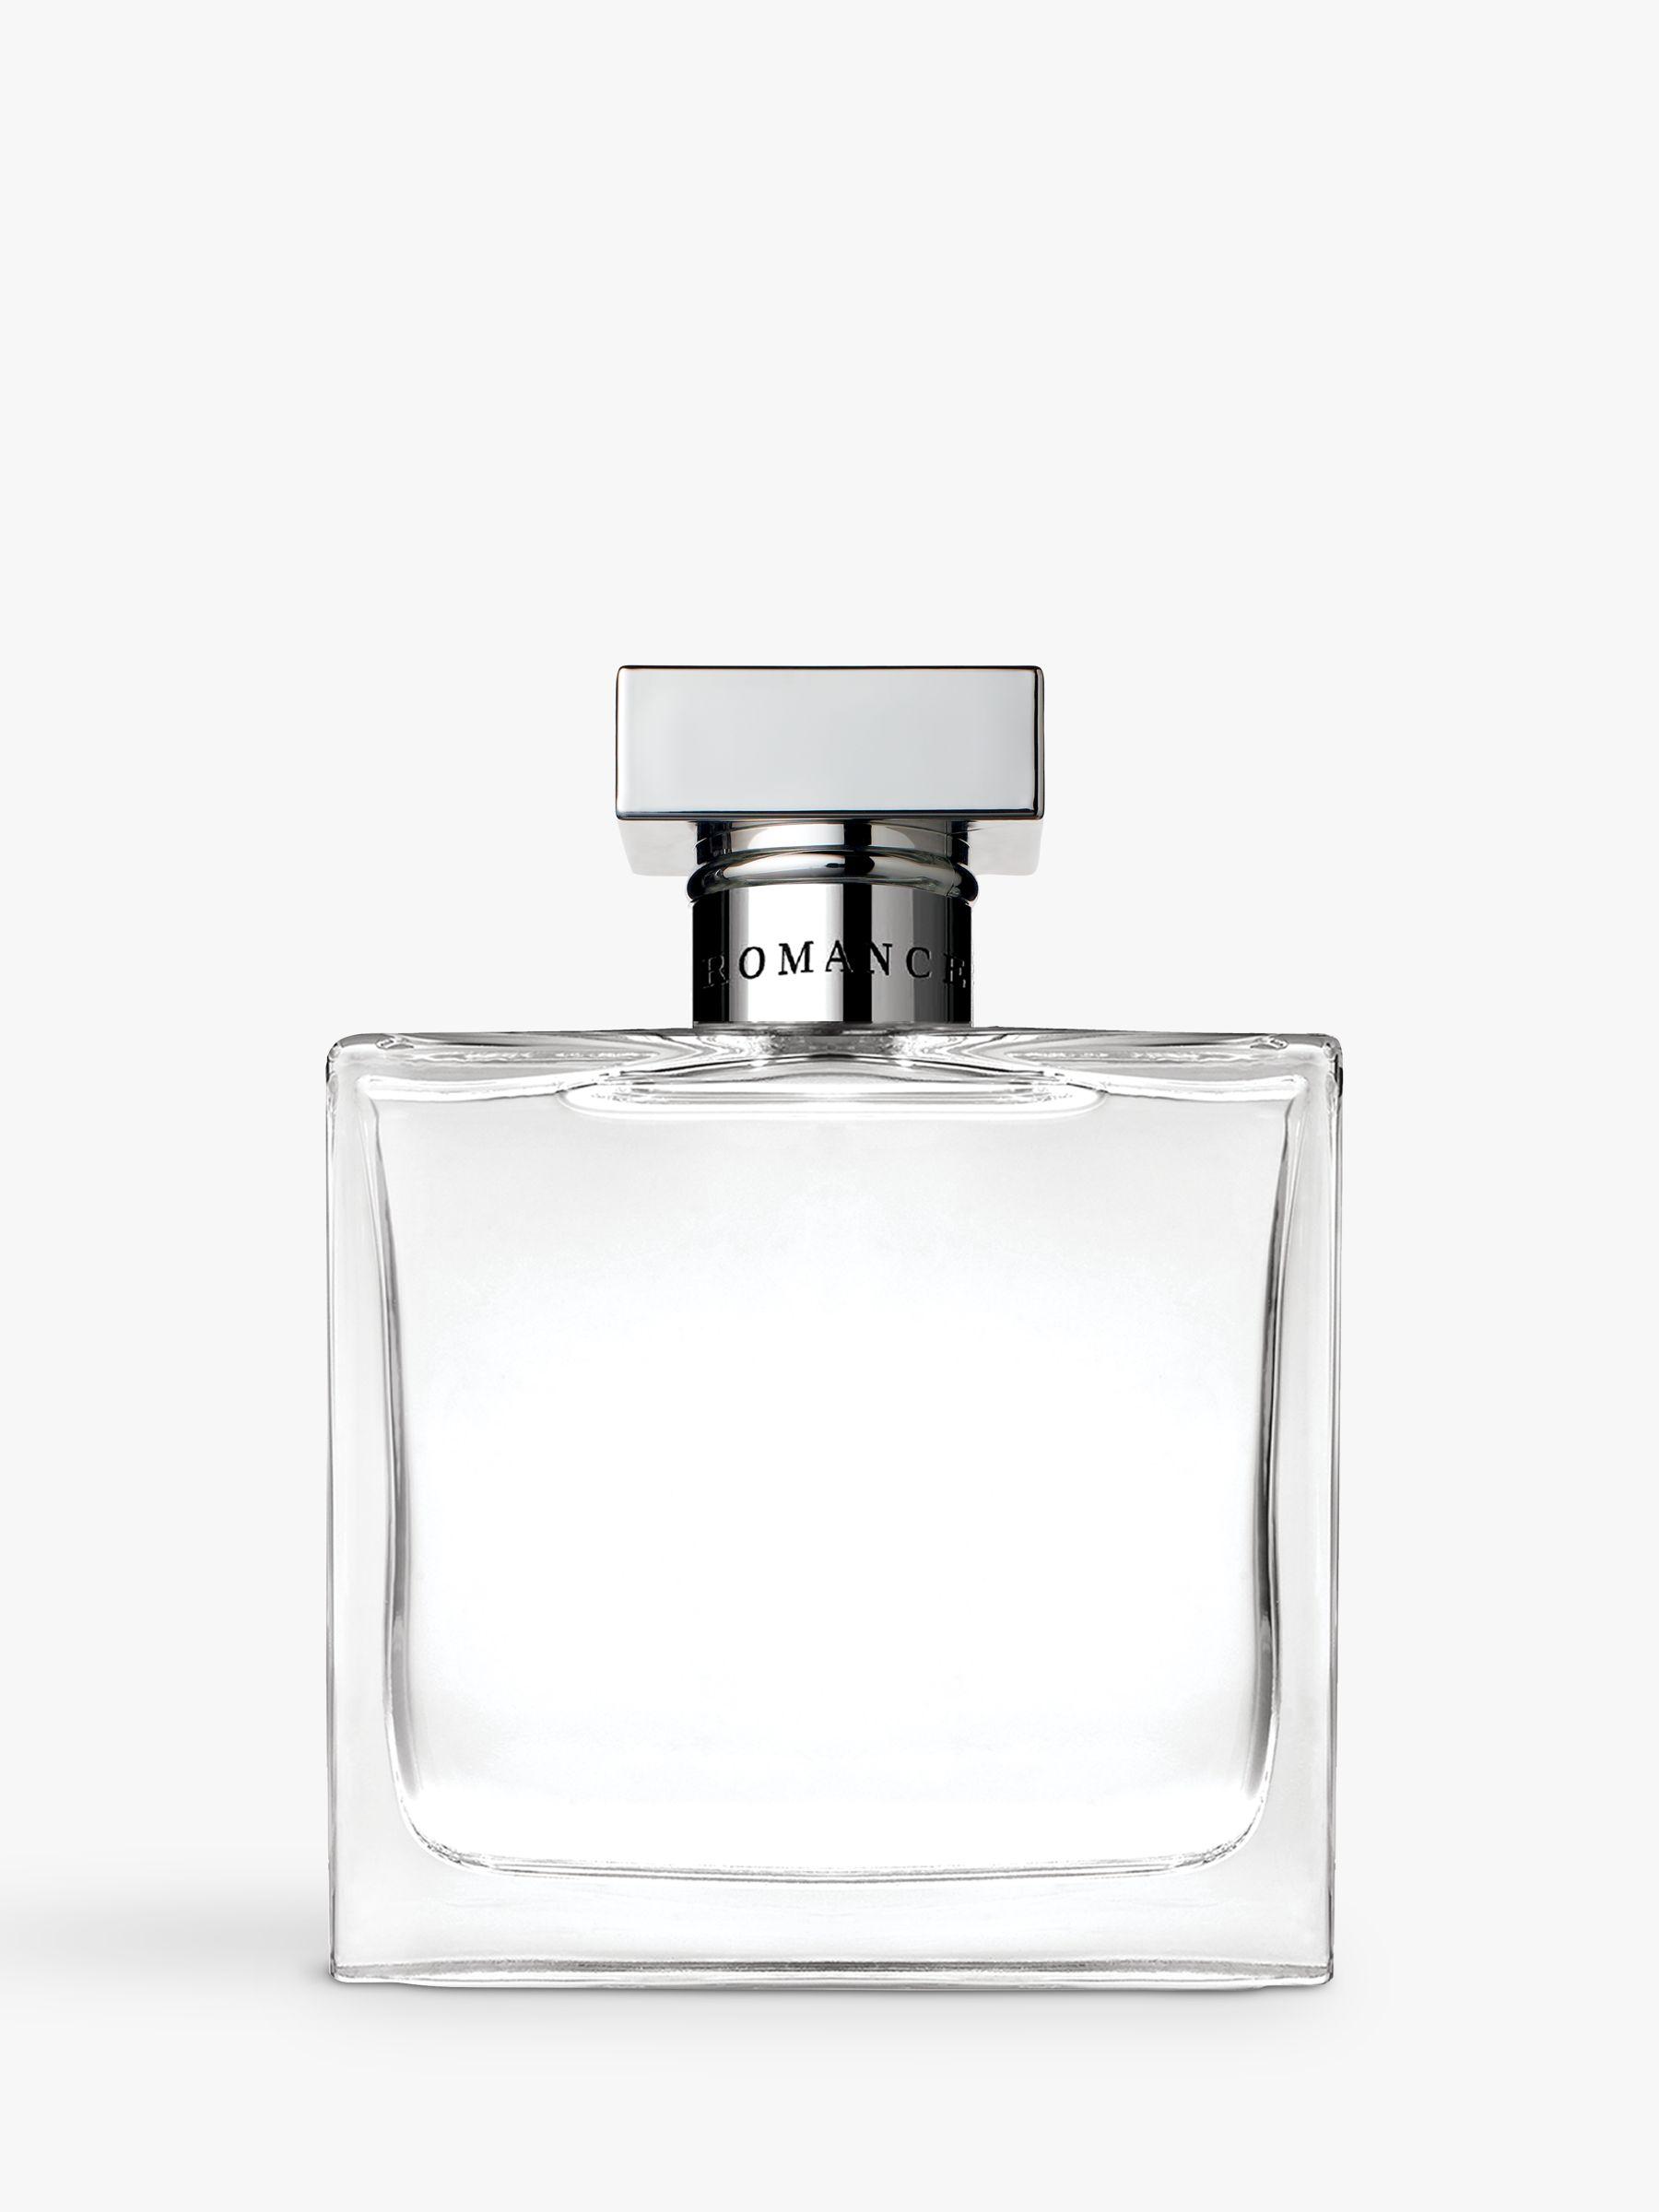 dc1dd025d2 Ralph Lauren Romance Eau de Parfum Spray at John Lewis & Partners